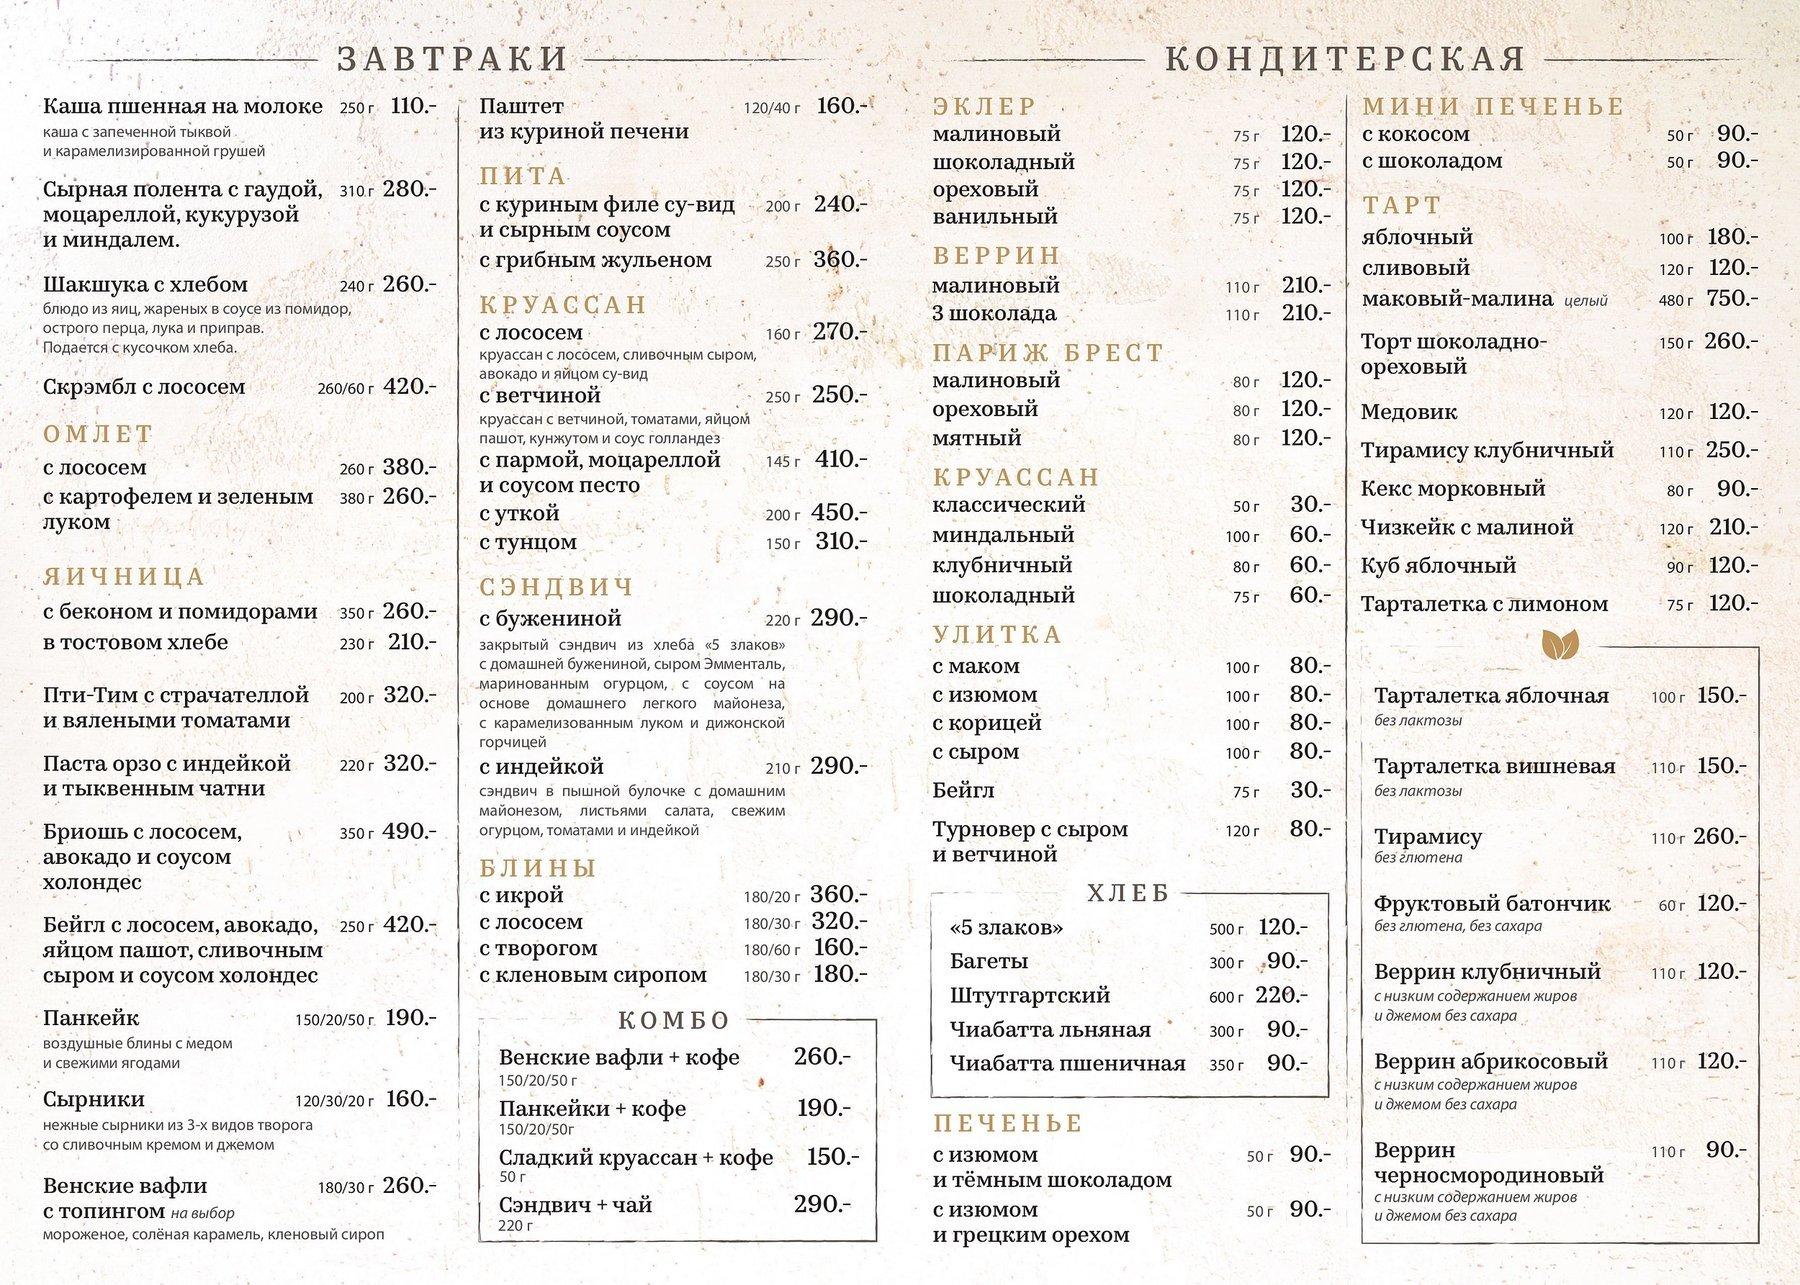 Меню ресторана Парк Джузеппе на набережной канала Грибоедова фото 22